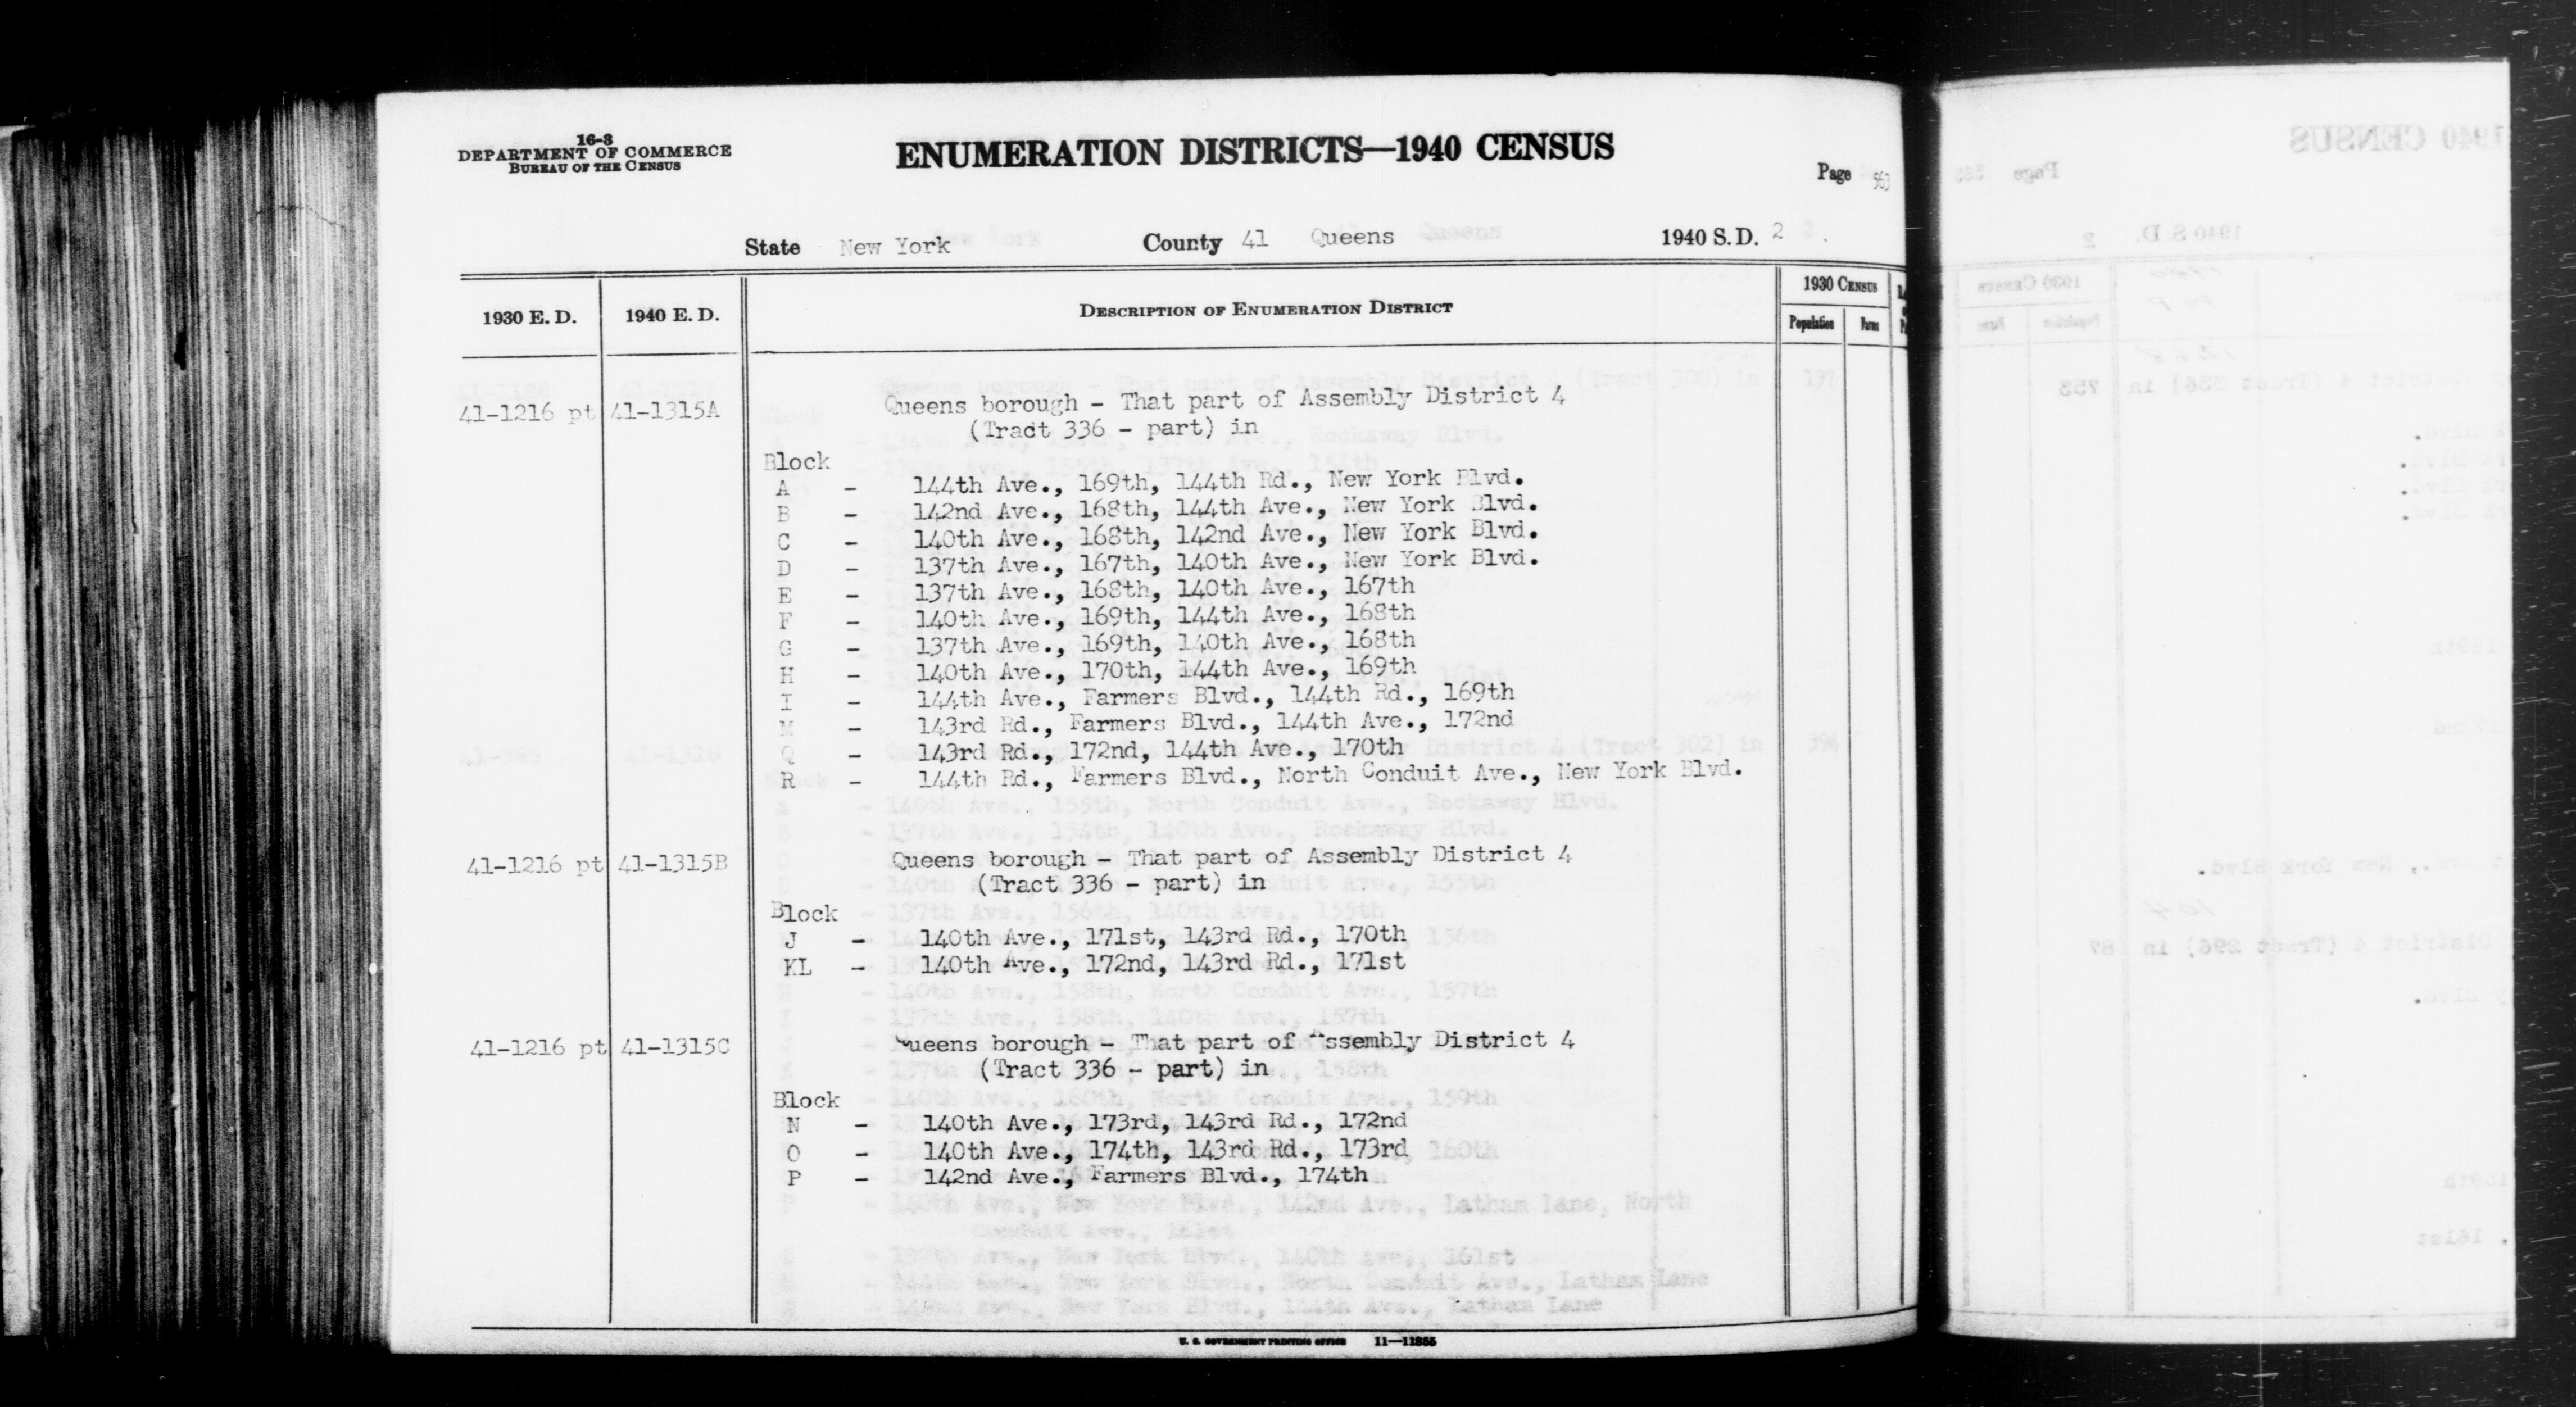 1940 Census Enumeration District Descriptions - New York - Queens County - ED 41-1315A, ED 41-1315B, ED 41-1315C